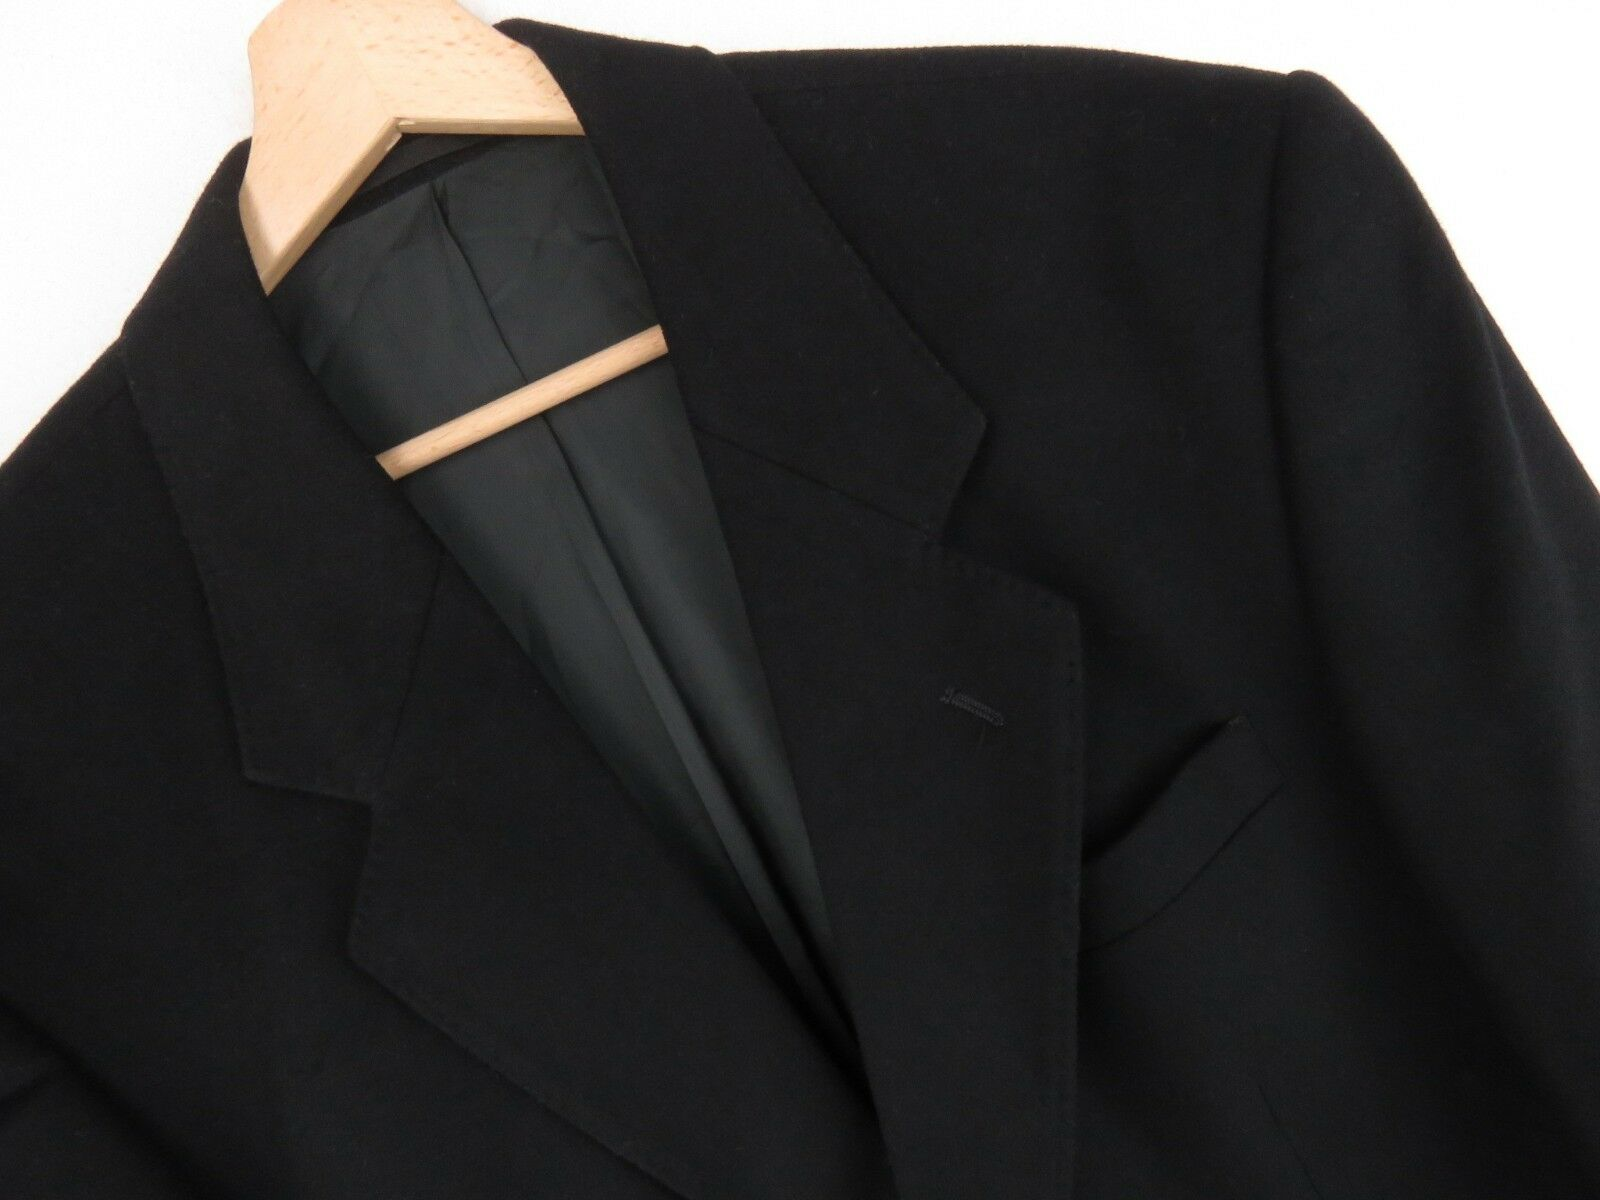 Lu945 Debenhams Veste Blazer black Laine-Cachemire Original Premium size 40r